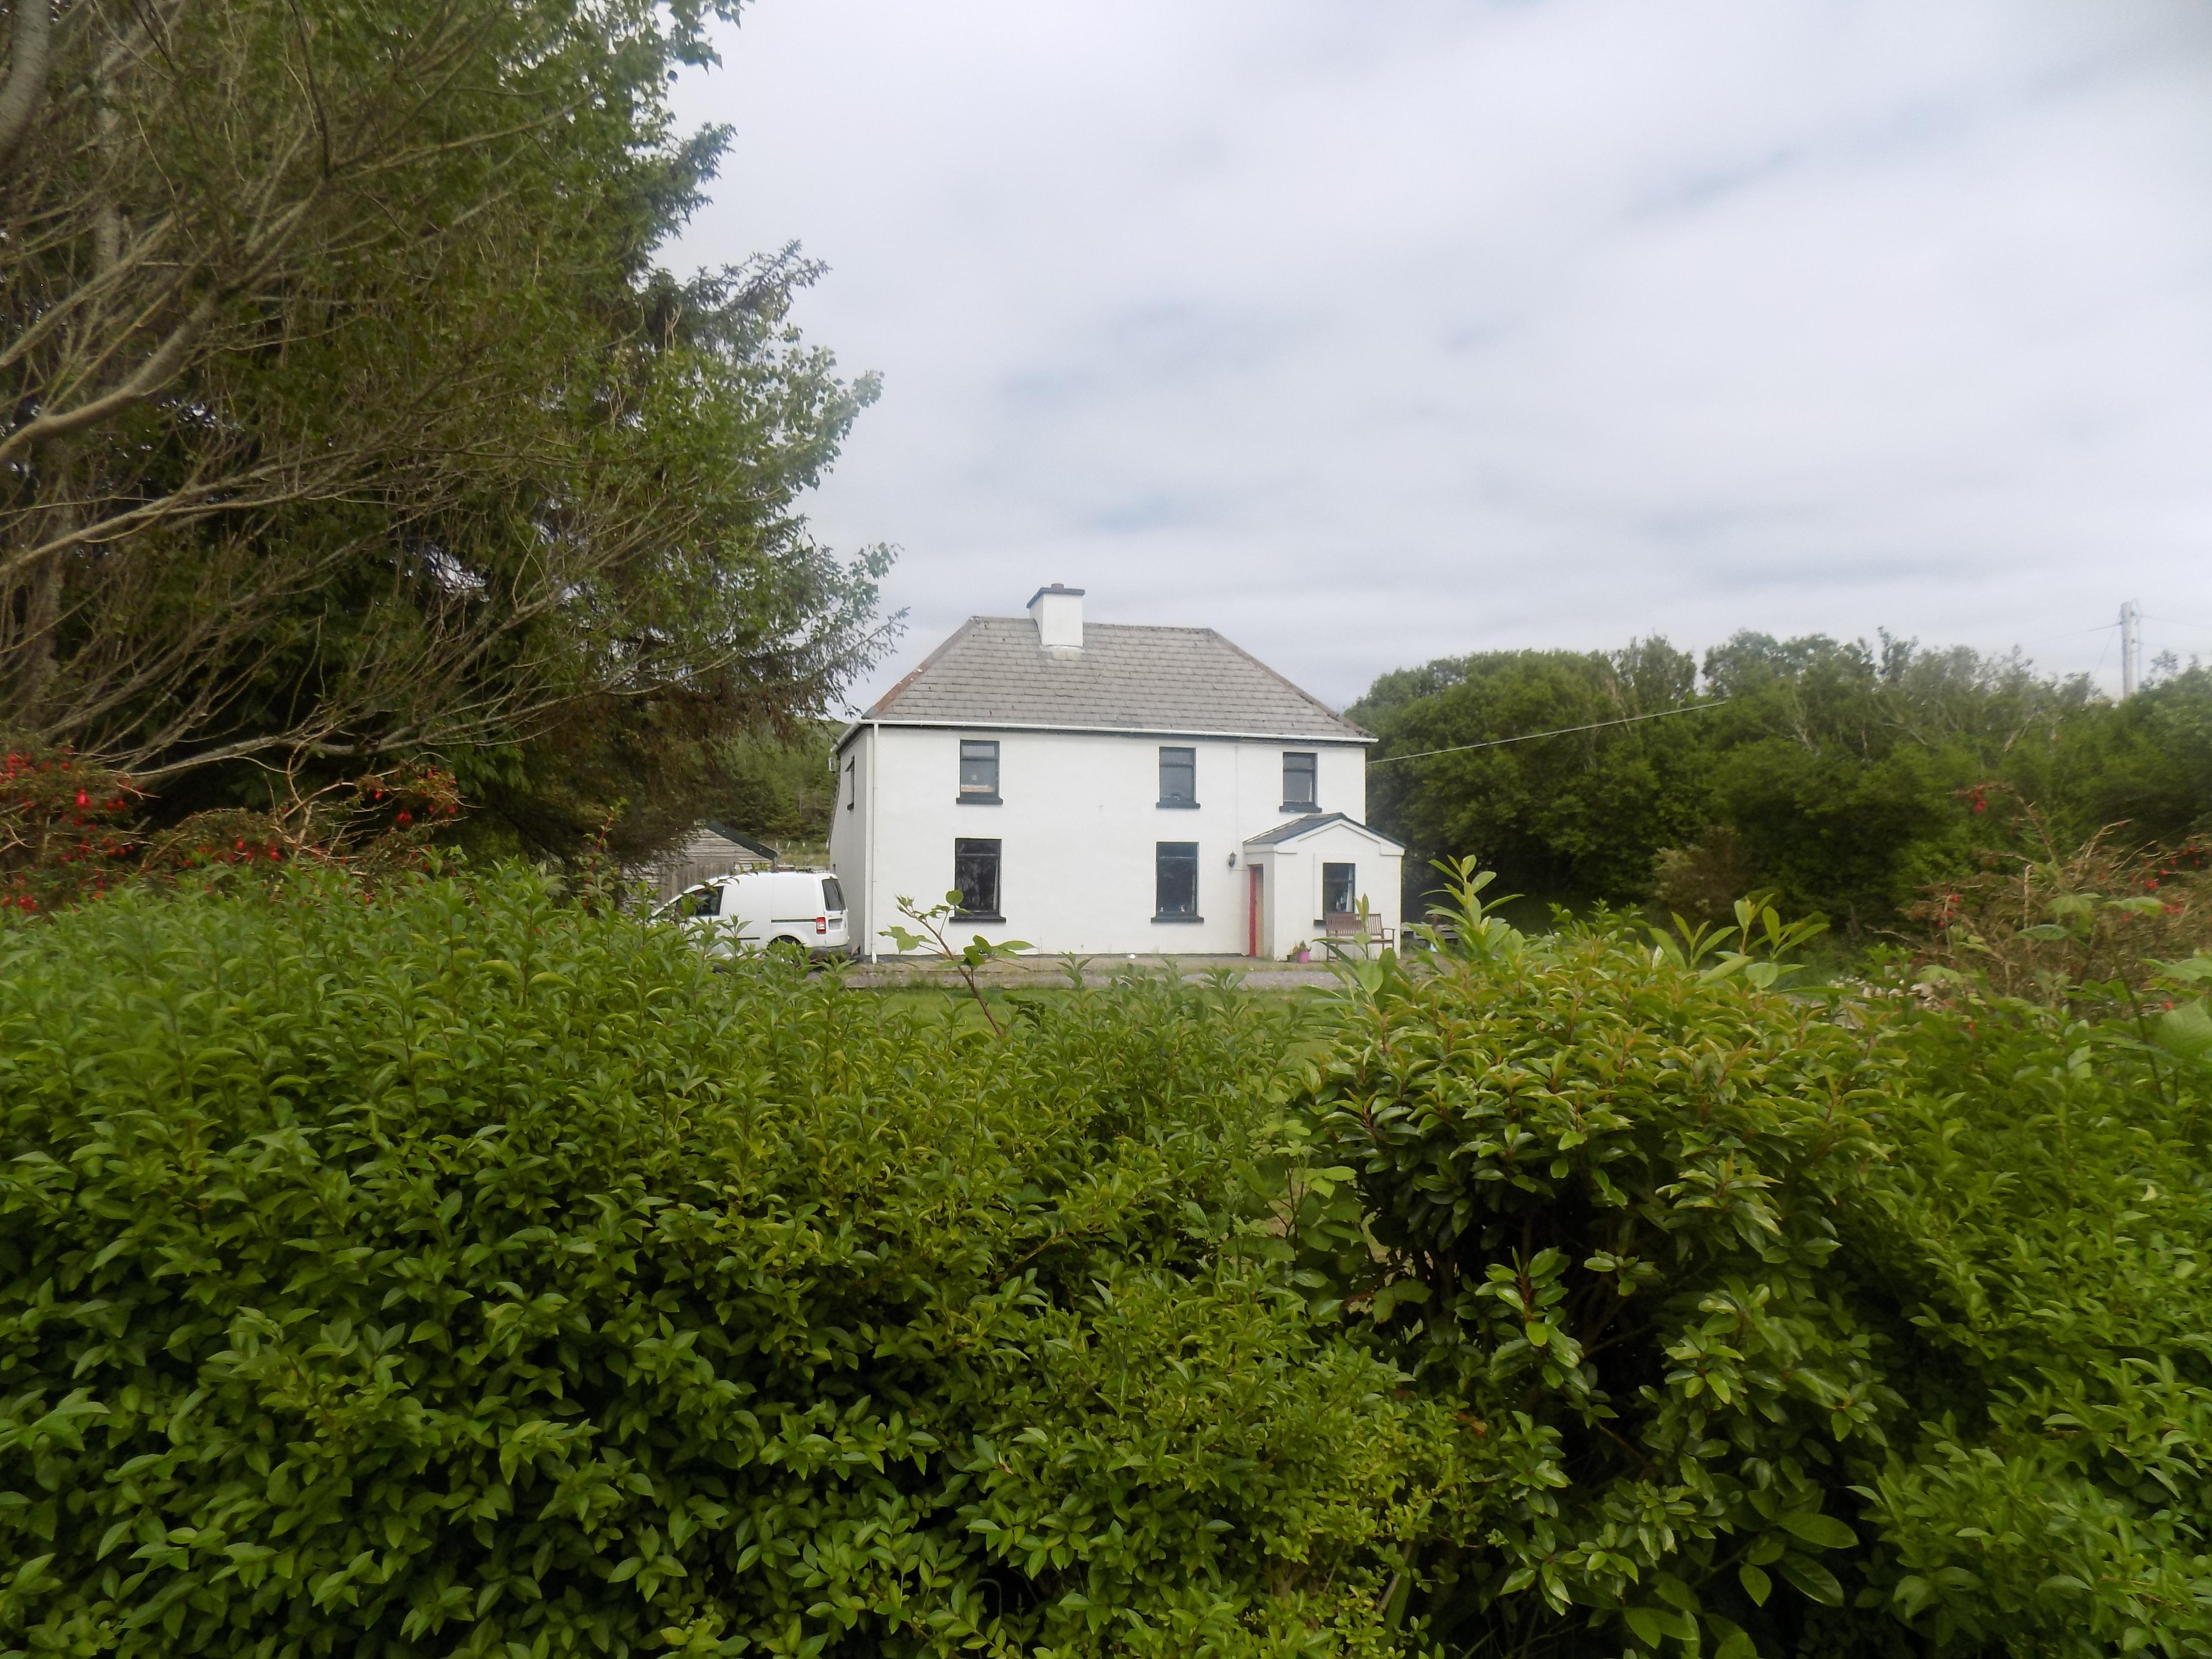 Traditional Style House – Kilmackerin West,  Aughtubrid, Cahersiveen, V23 R761